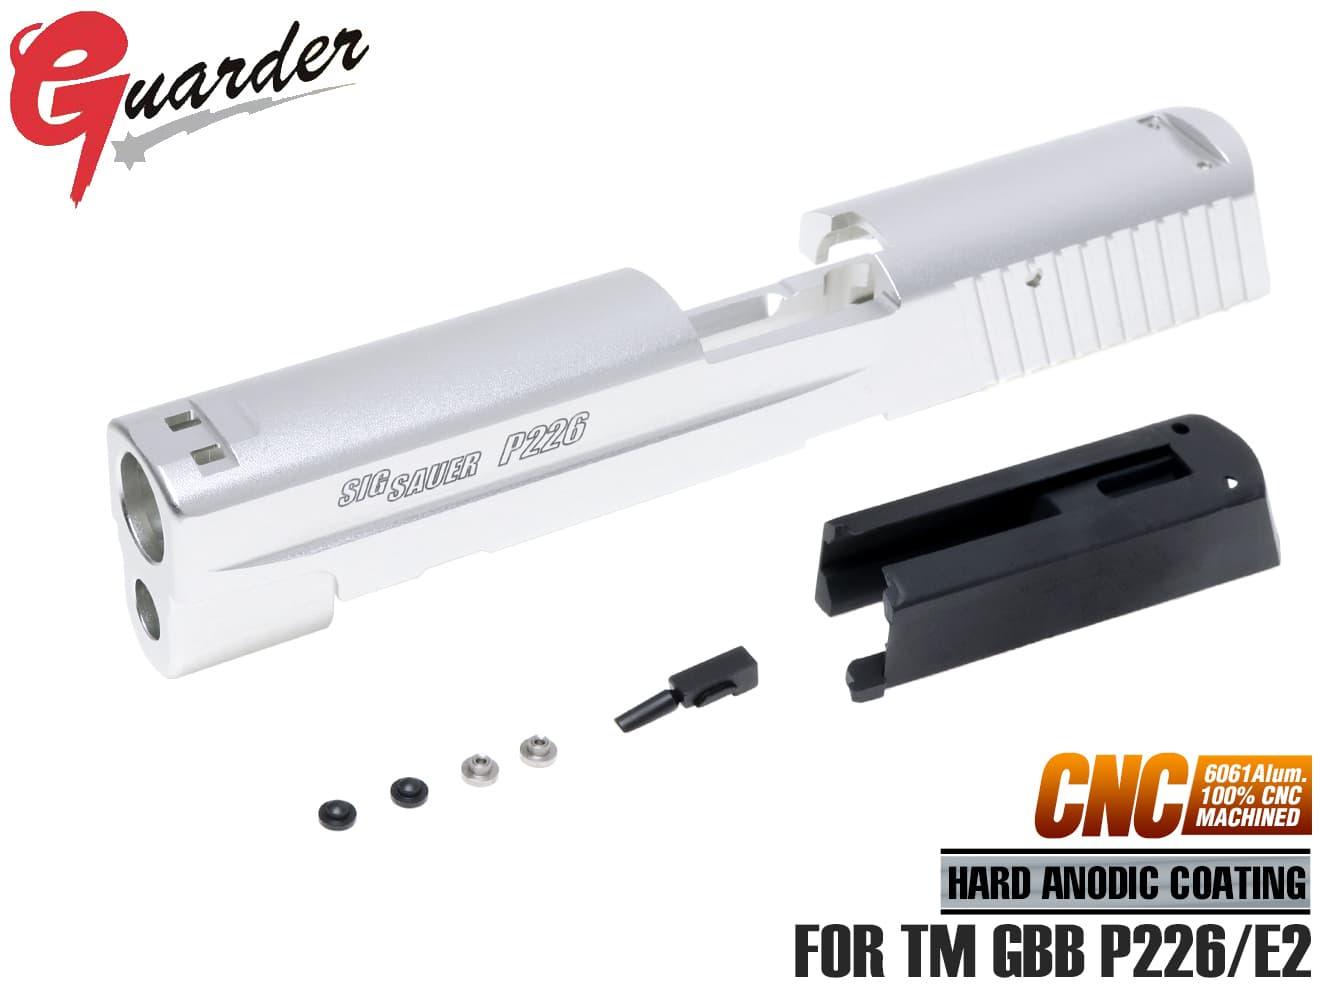 P226/E2用◆マルイ A6061 Late P226-47(SV)■GUARDER for Version Marking マルイ リアルに再現 アルミ CNCスライド ガスブロ 実物後期型形状 P226/E2用